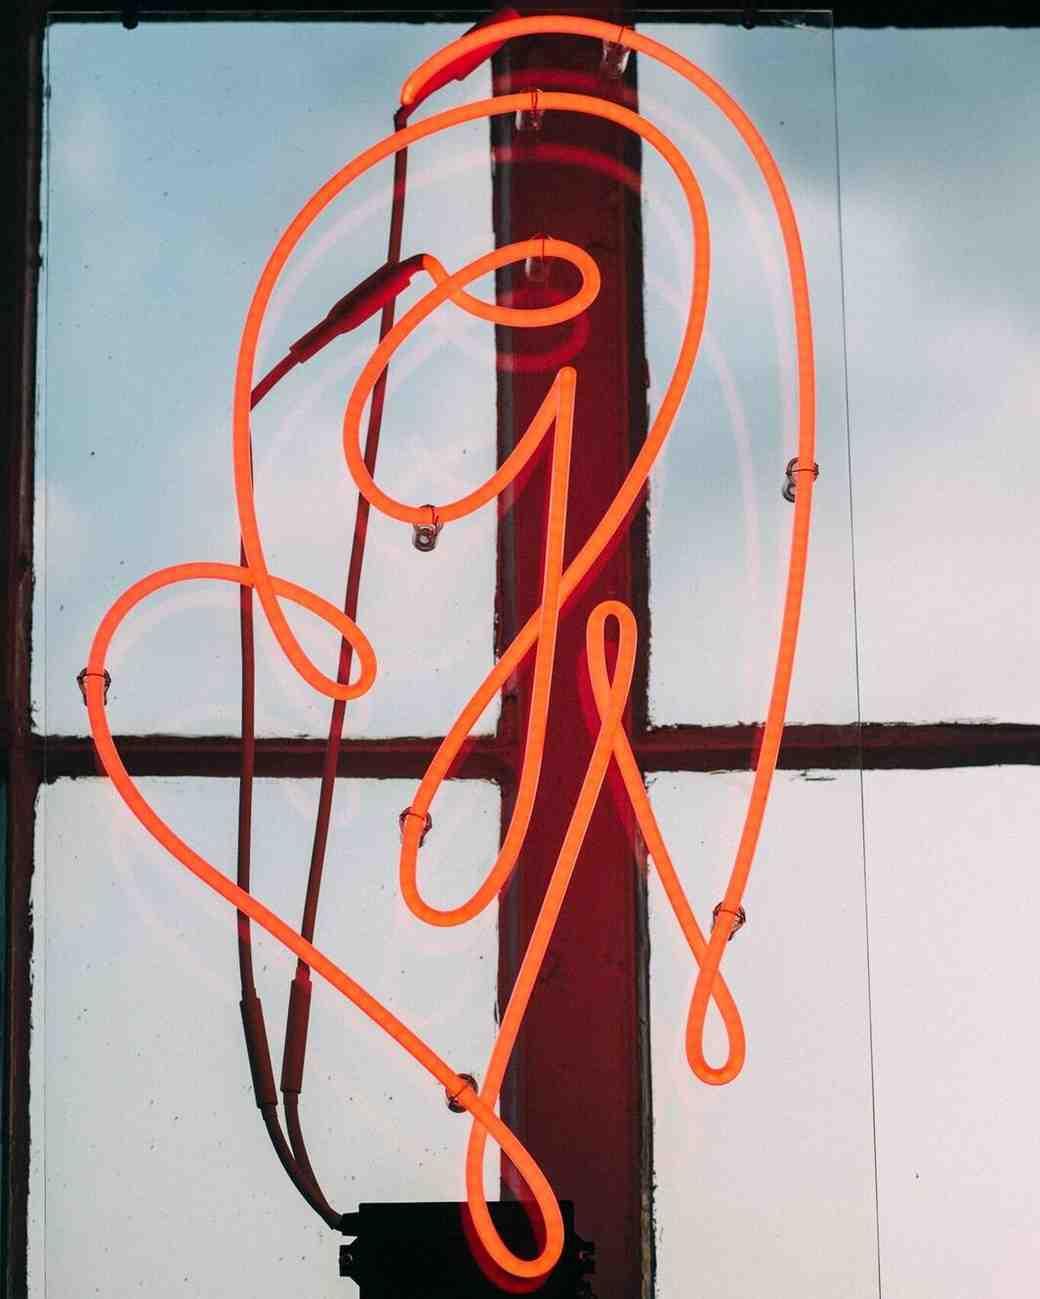 monogram neon sign